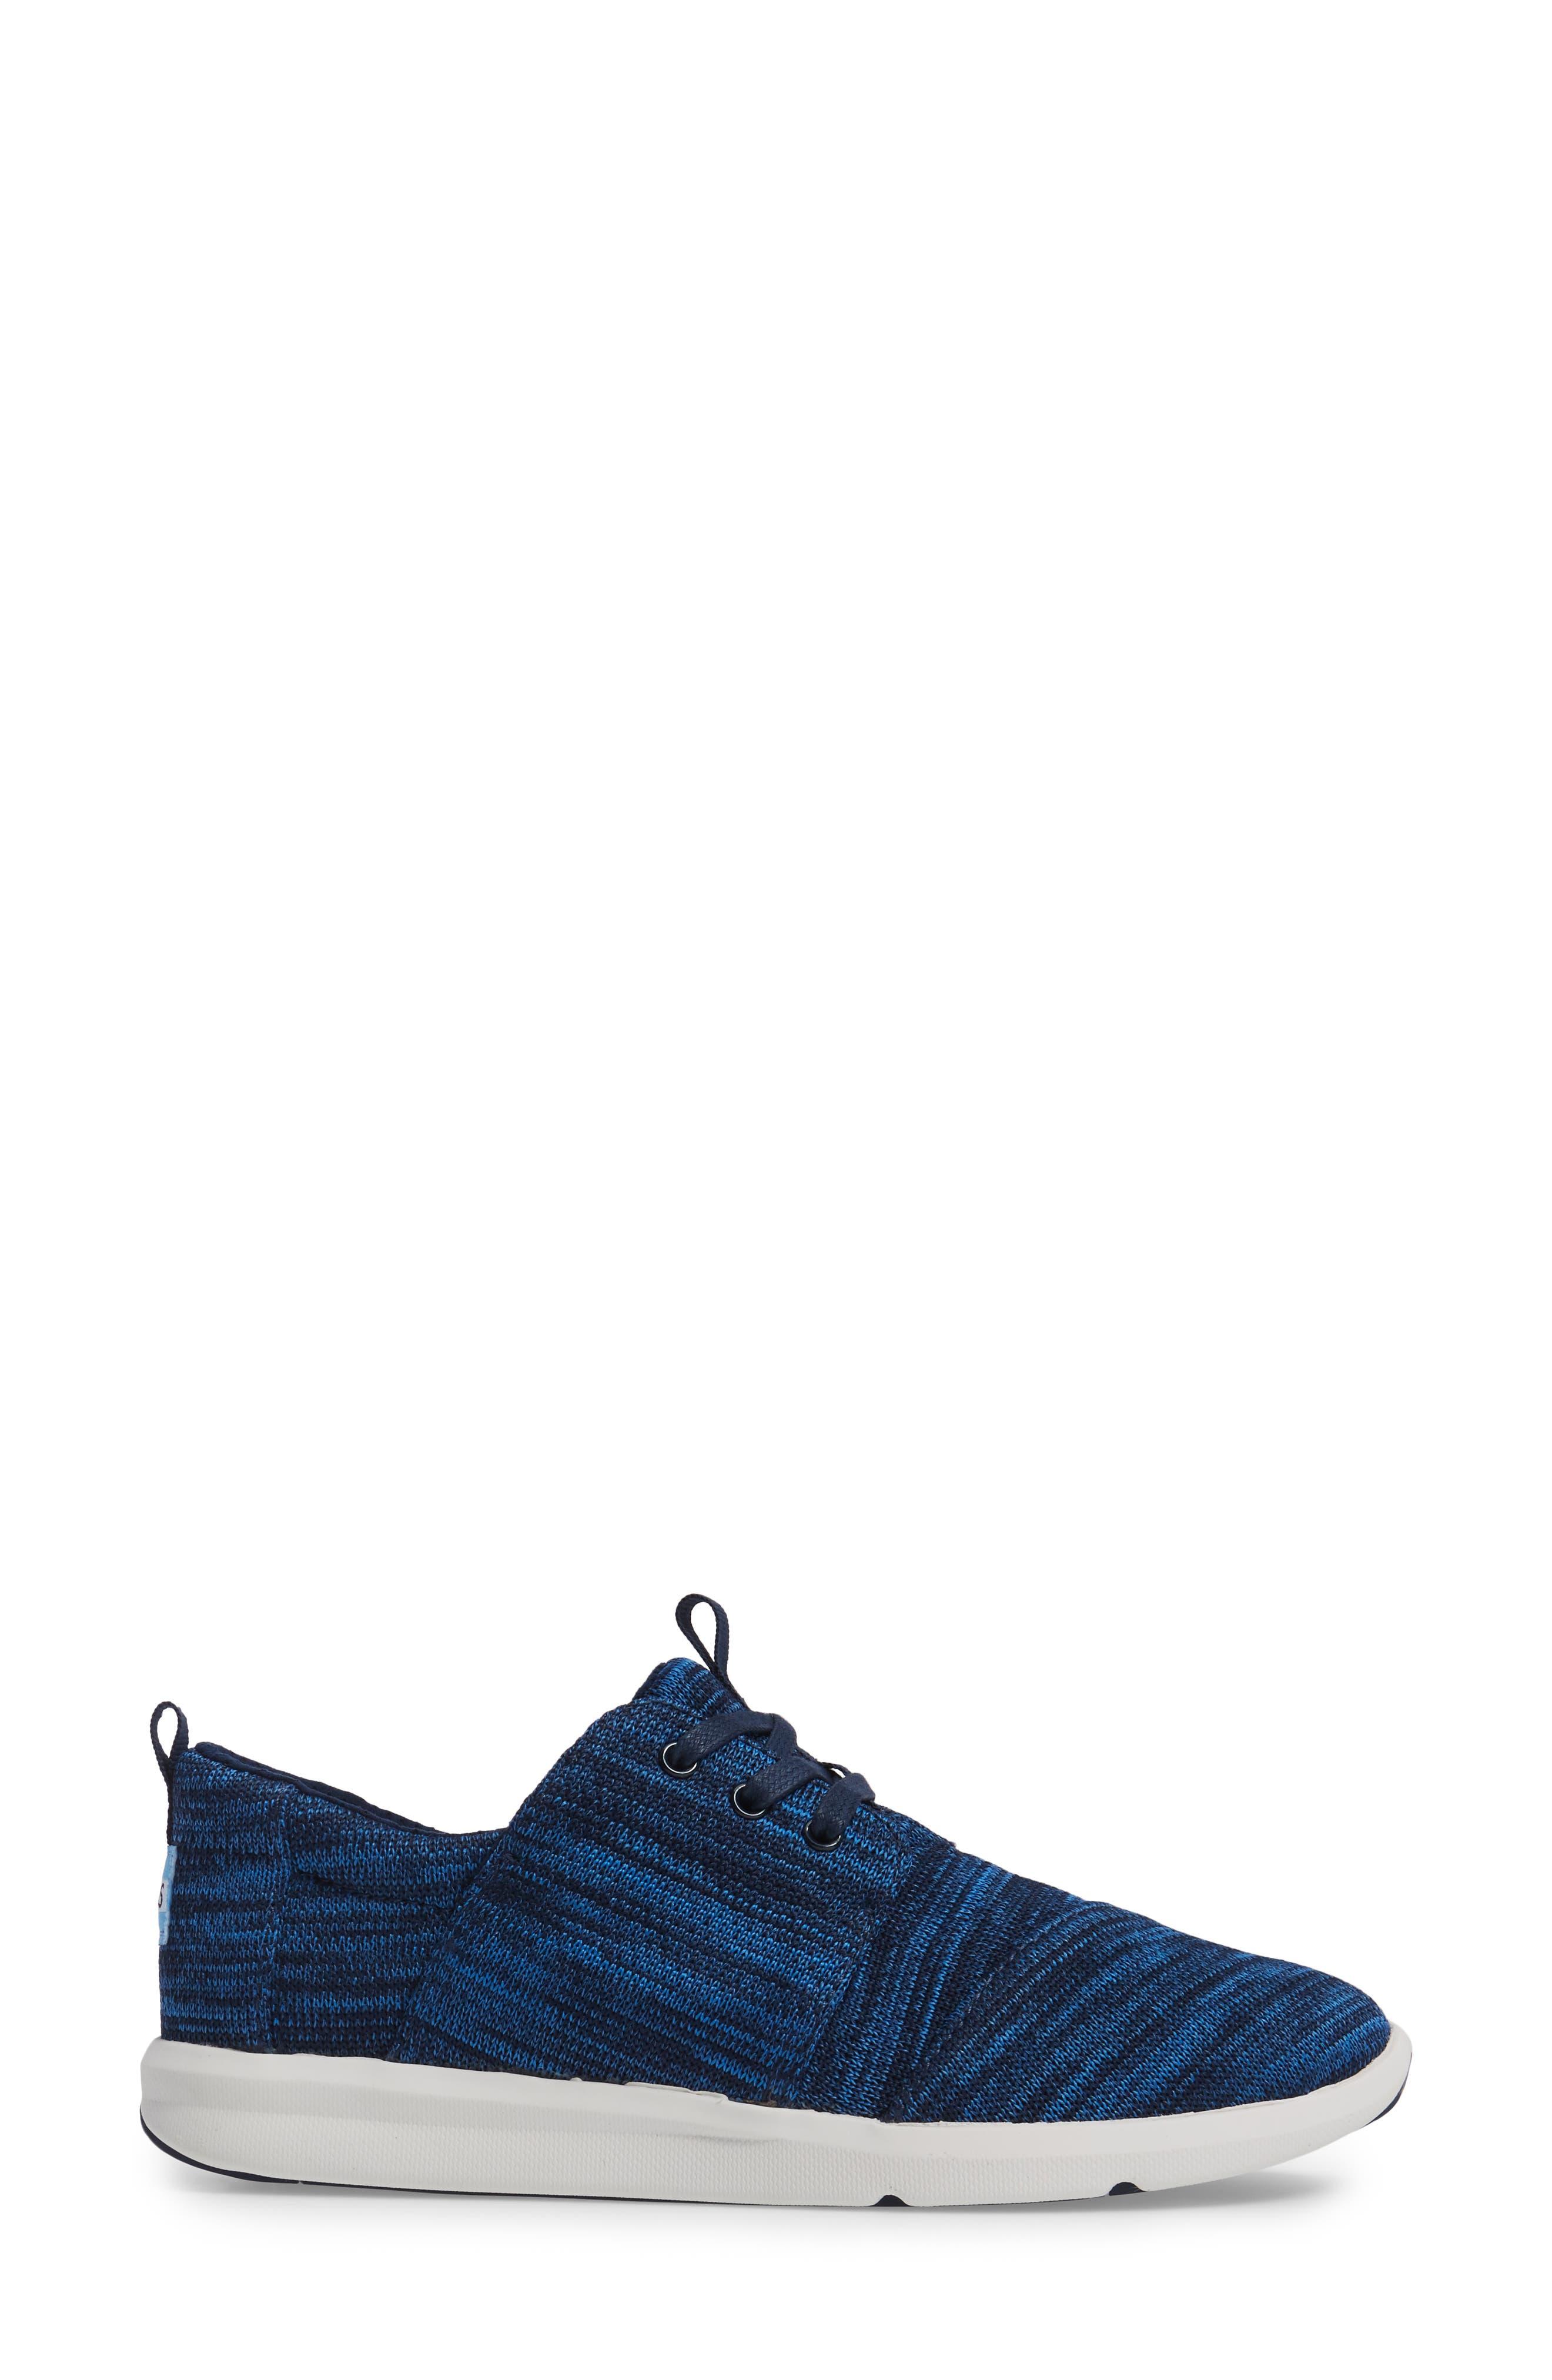 Alternate Image 3  - TOMS 'Del Ray' Sneaker (Women)